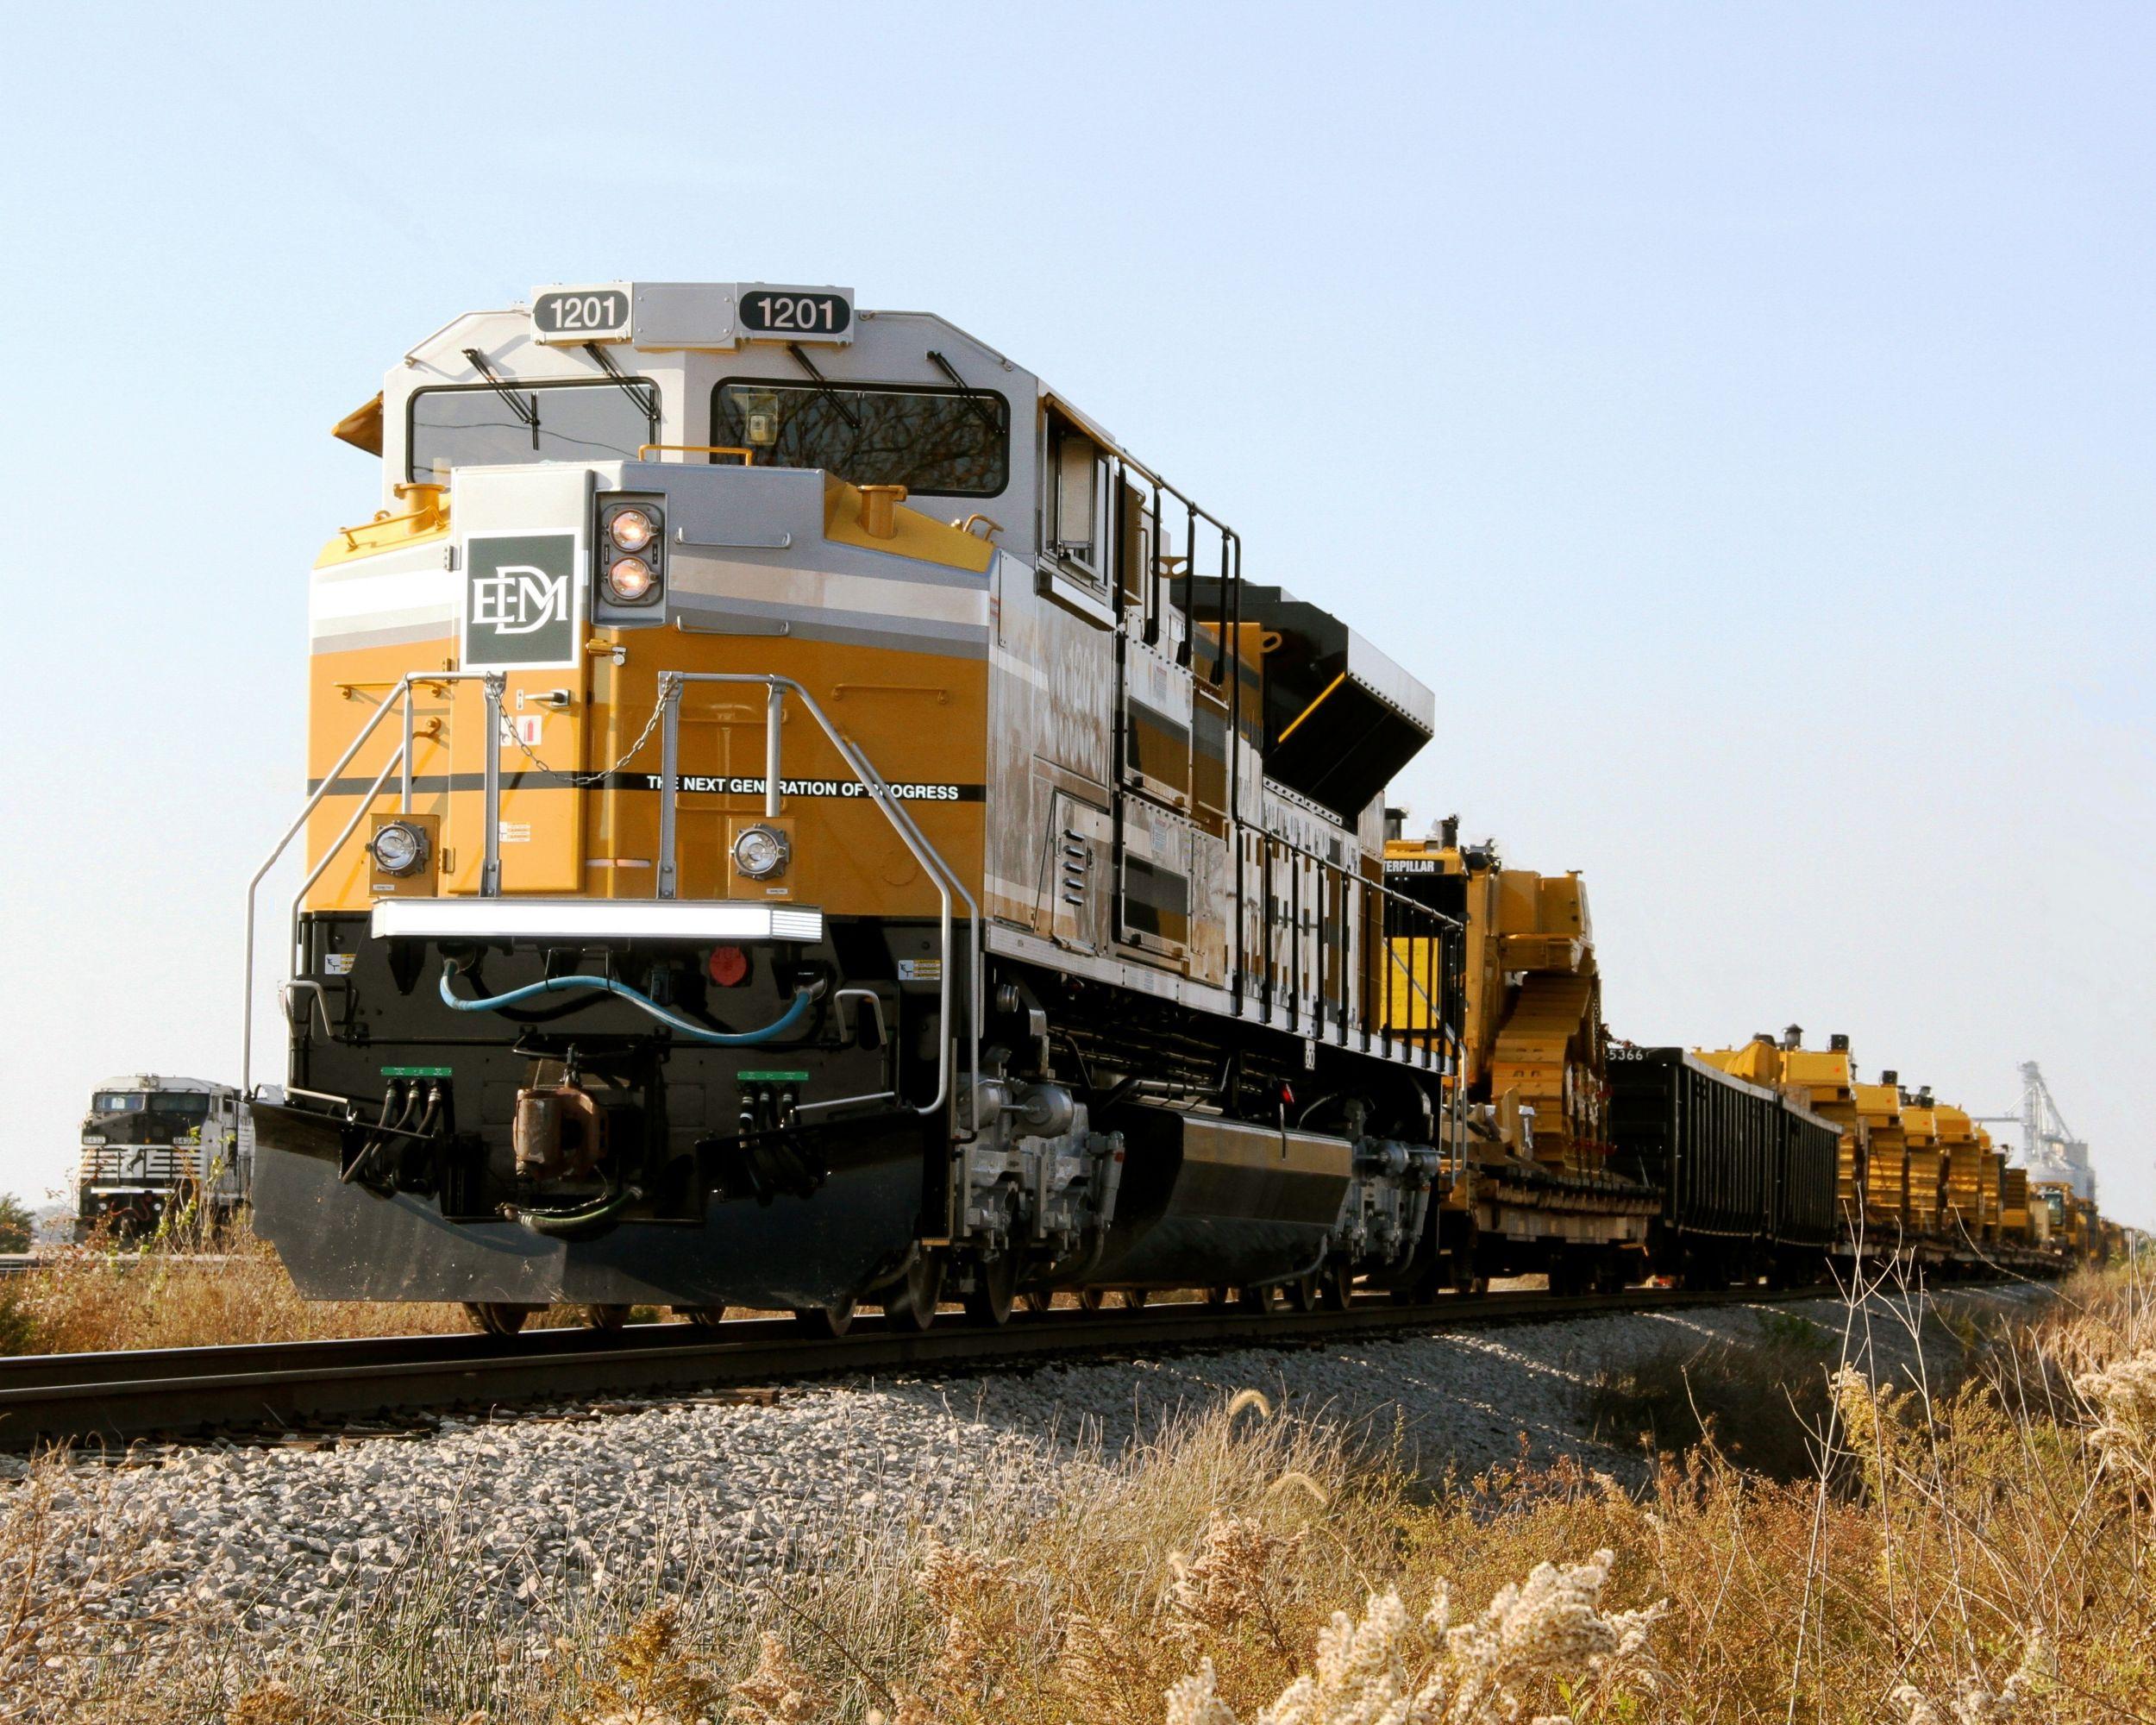 An EMD engine pulls a trainload of Caterpillar dozers.